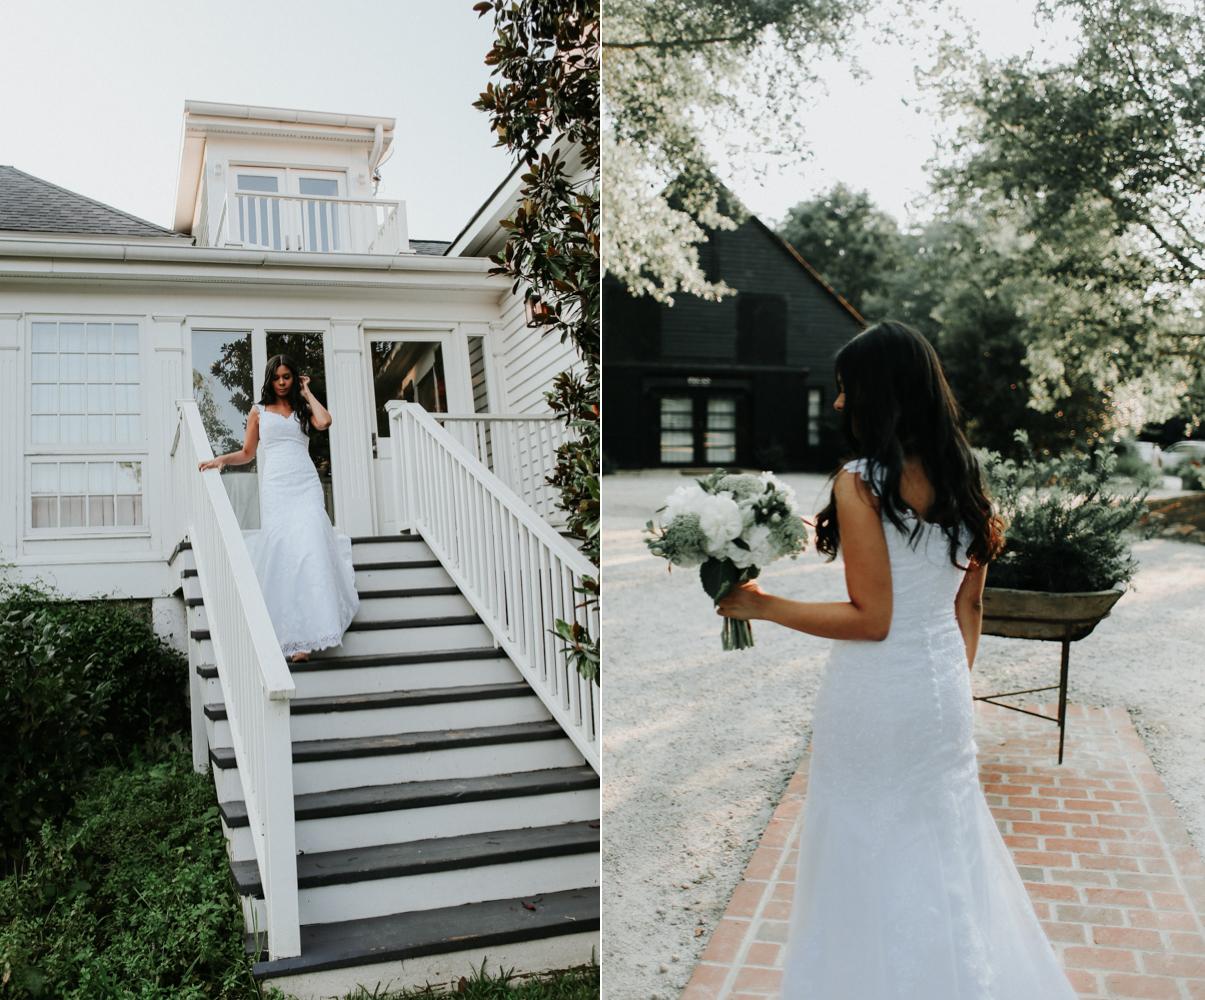 Atlanta_wedding_photographer_Inn_at_Serembe_intimate_elopement_sunset_artistic_photography_Gabriela_and_Felipe_doble18.jpg